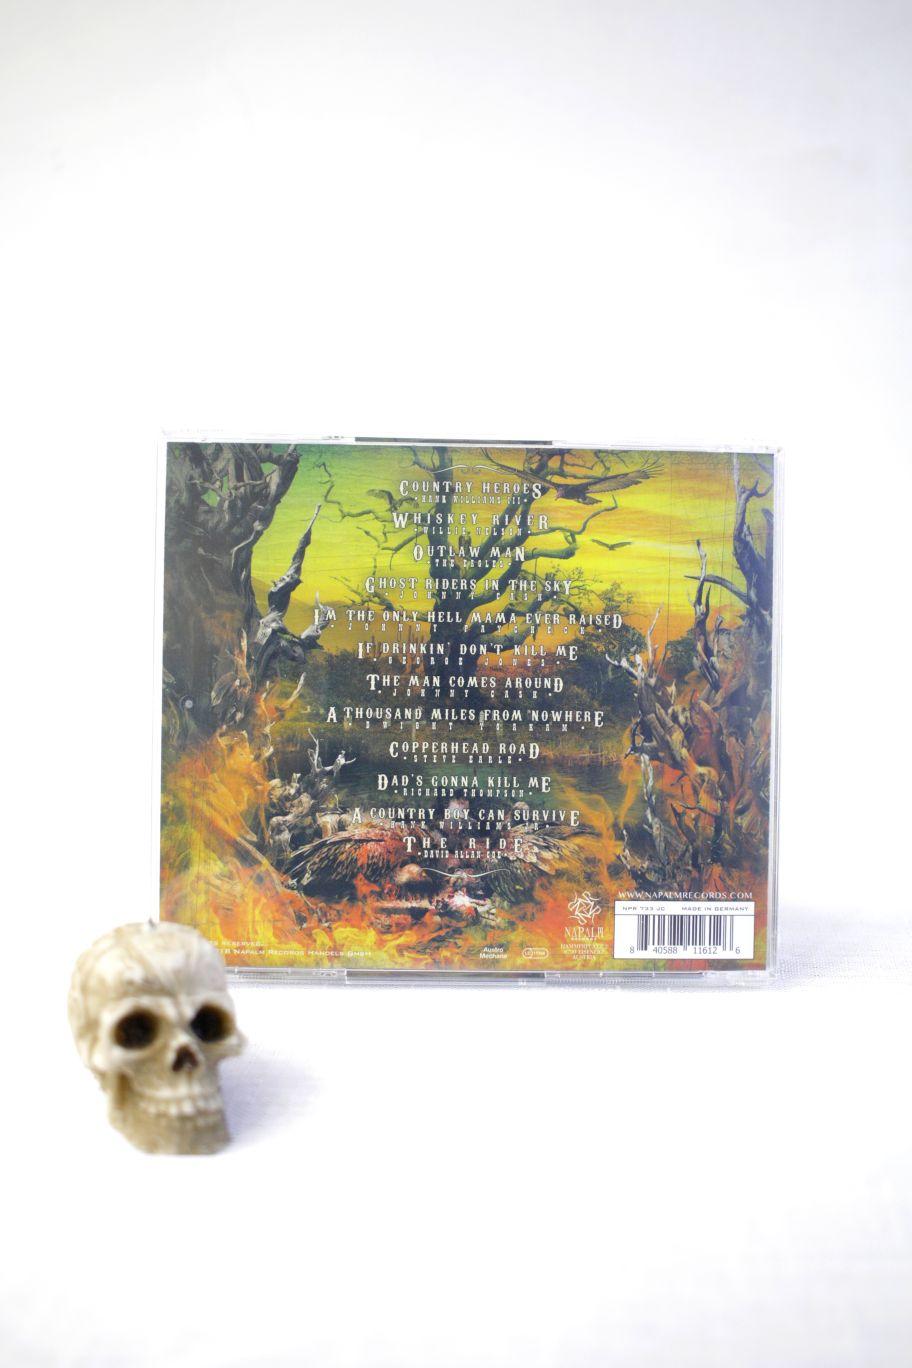 CDS DEVILDRIVER OUTLAWS TILL THE END, VOL 1